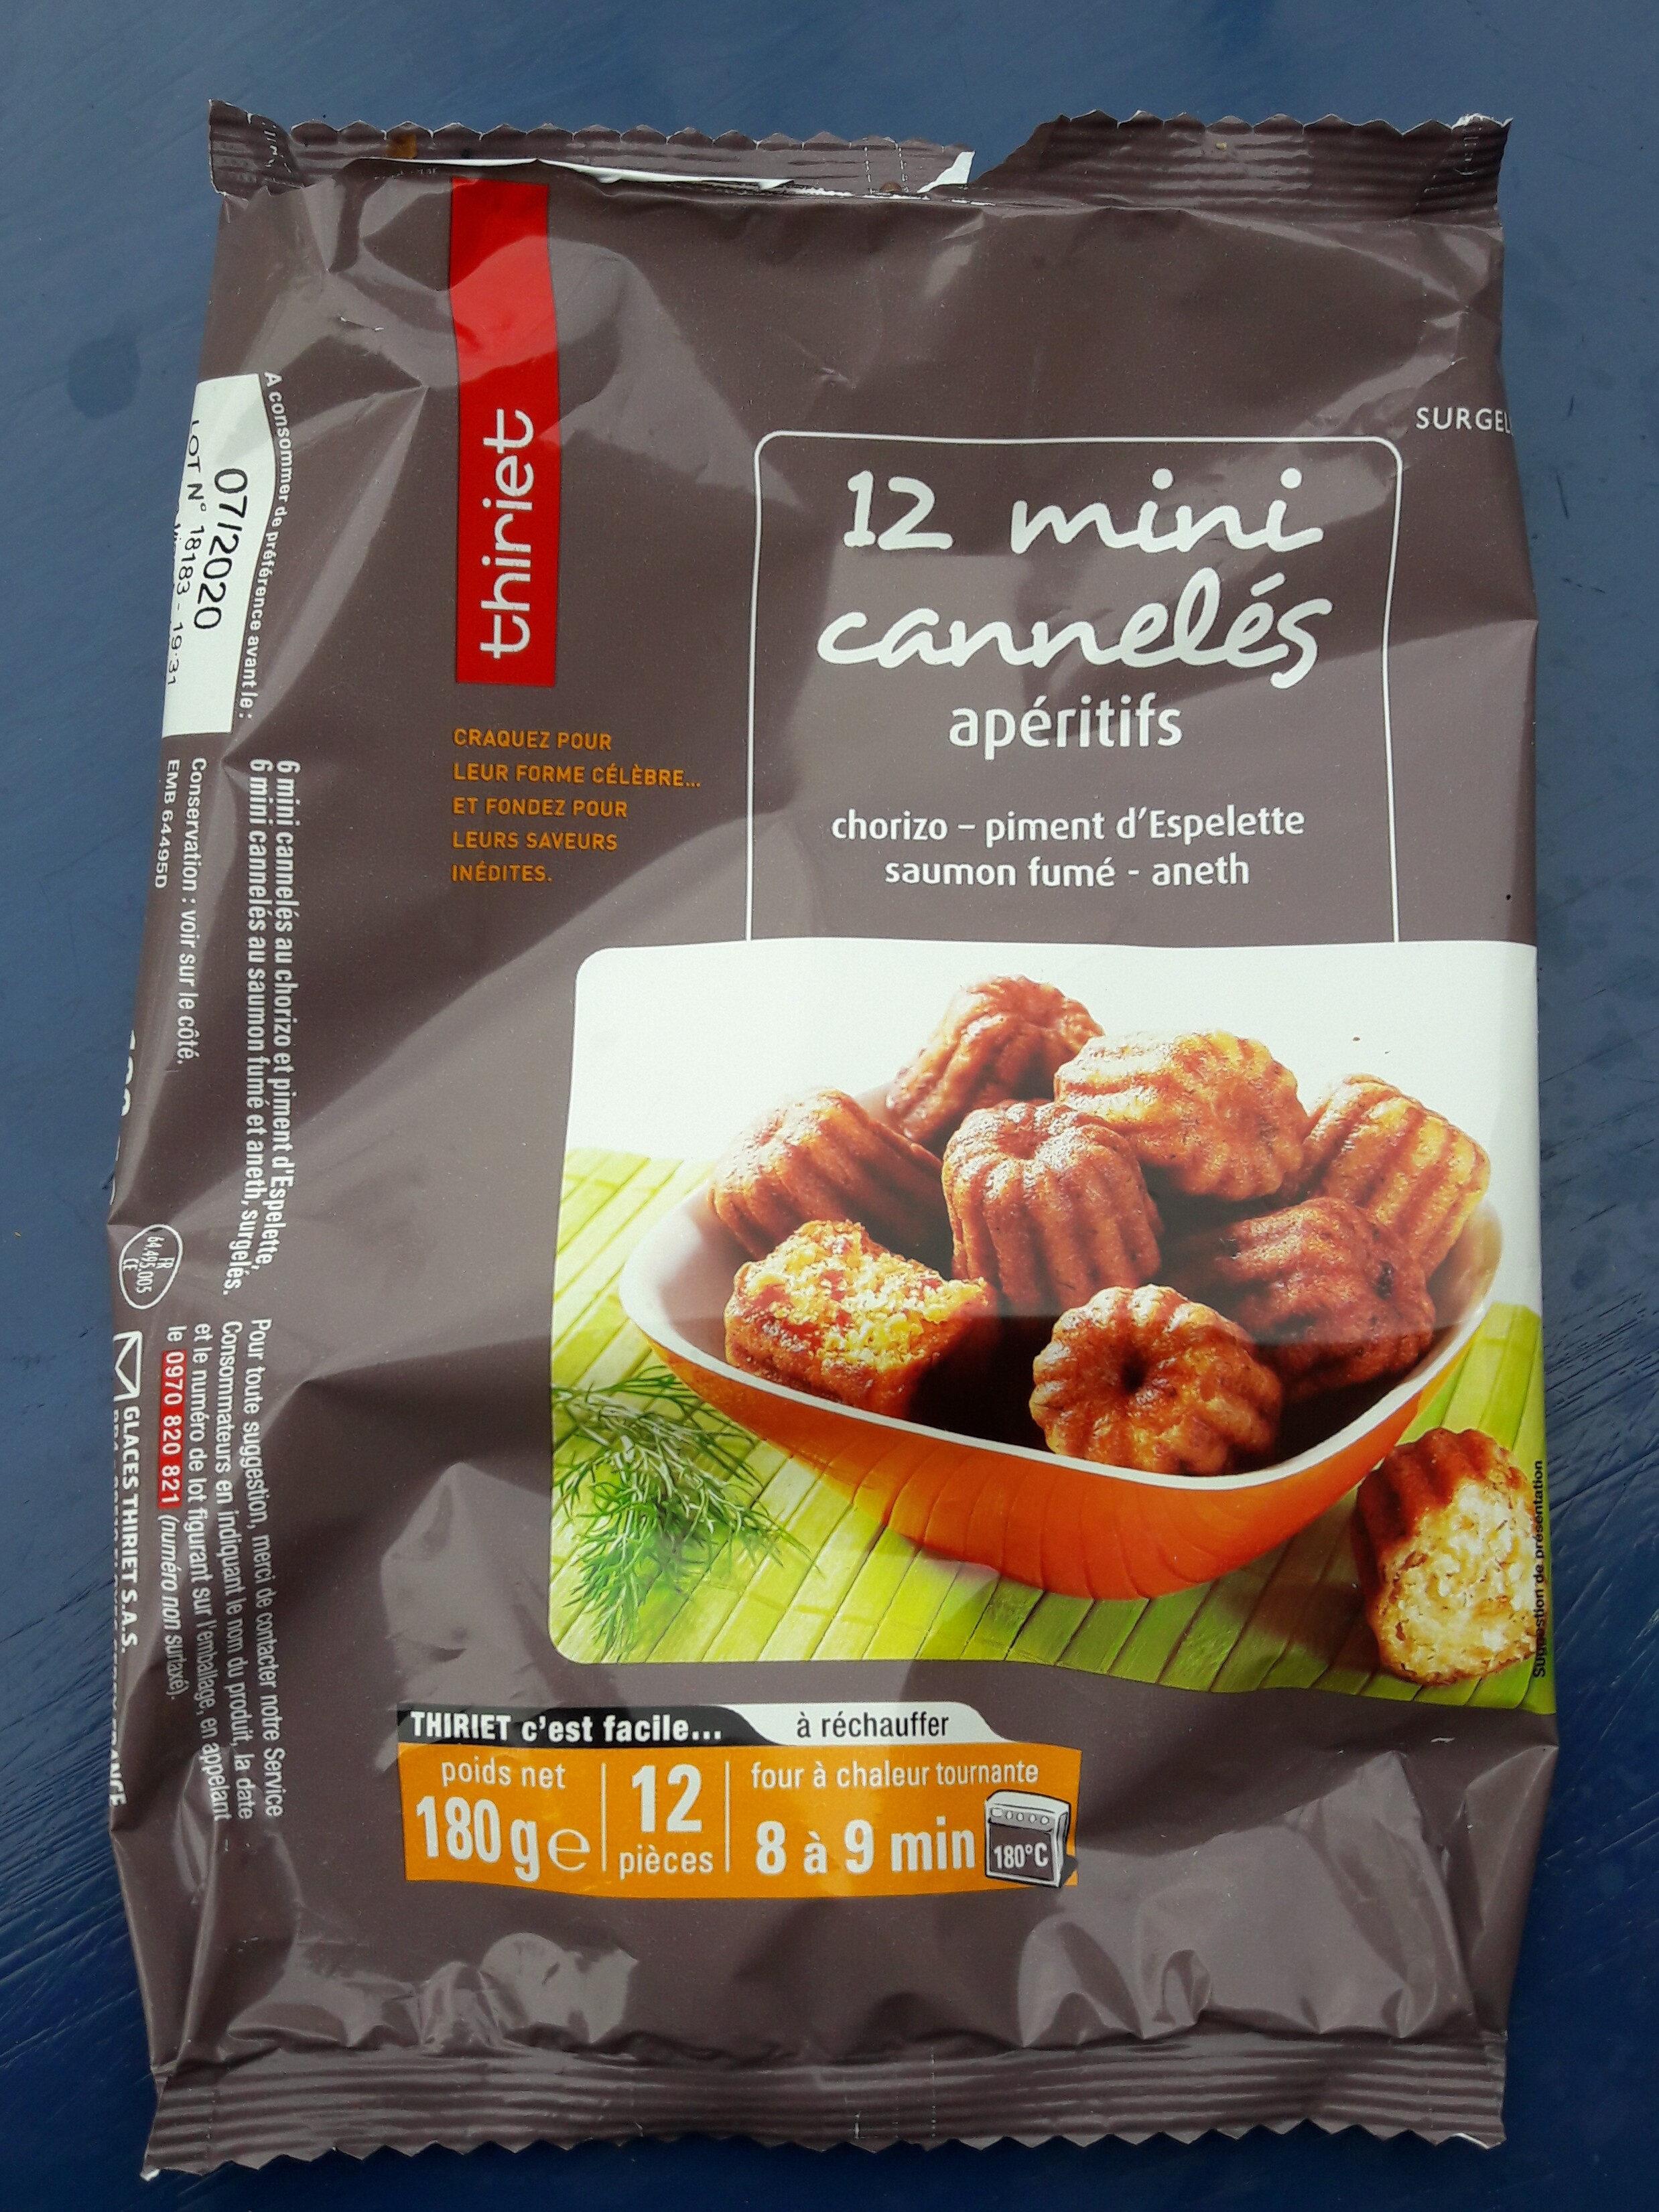 mini canelés apéritifs - Product - fr